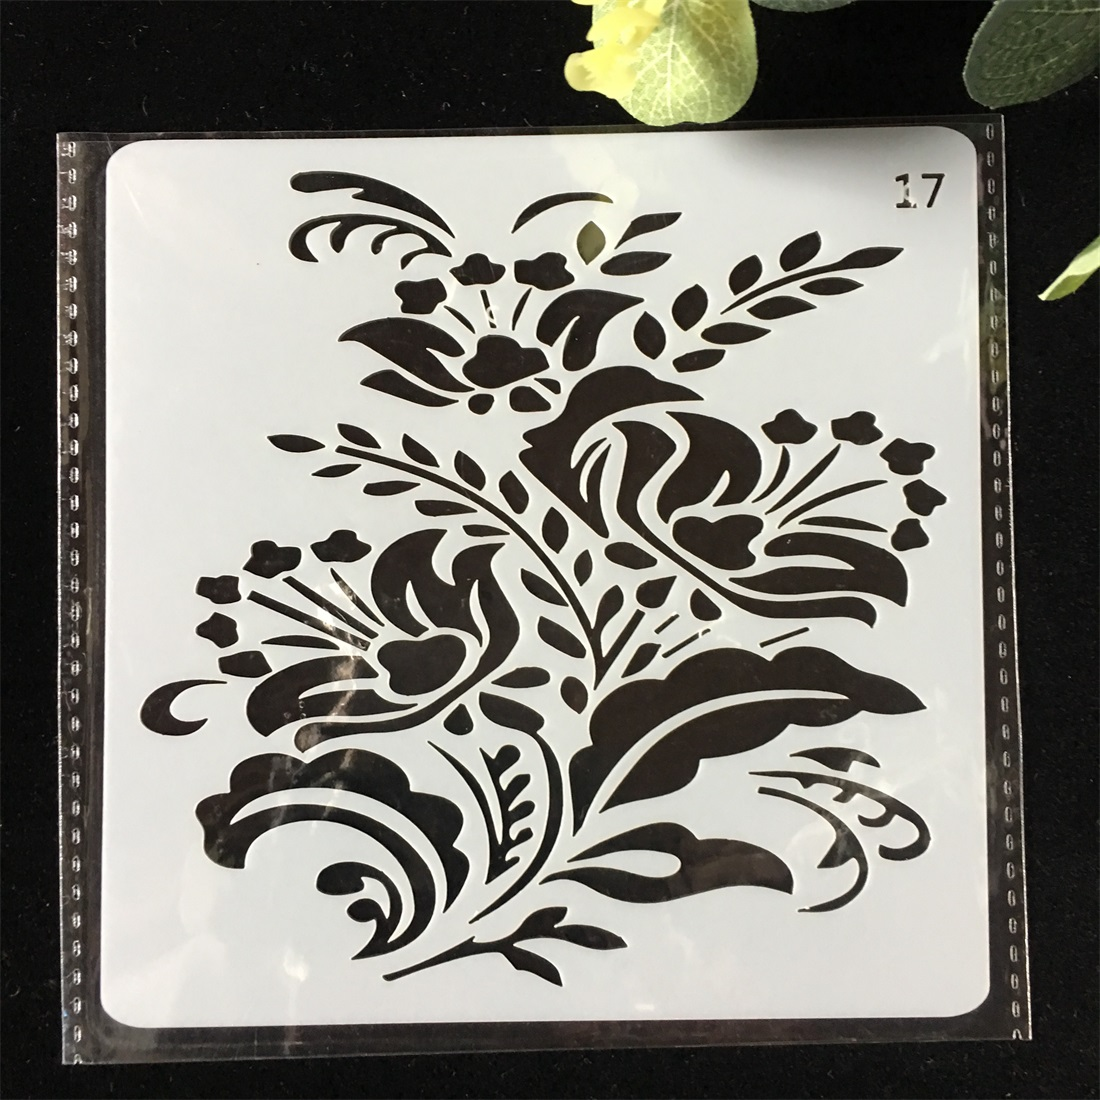 1Pcs 13cm Flower DIY Layering Stencils Wall Painting Scrapbook Coloring Embossing Album Decorative Card Template